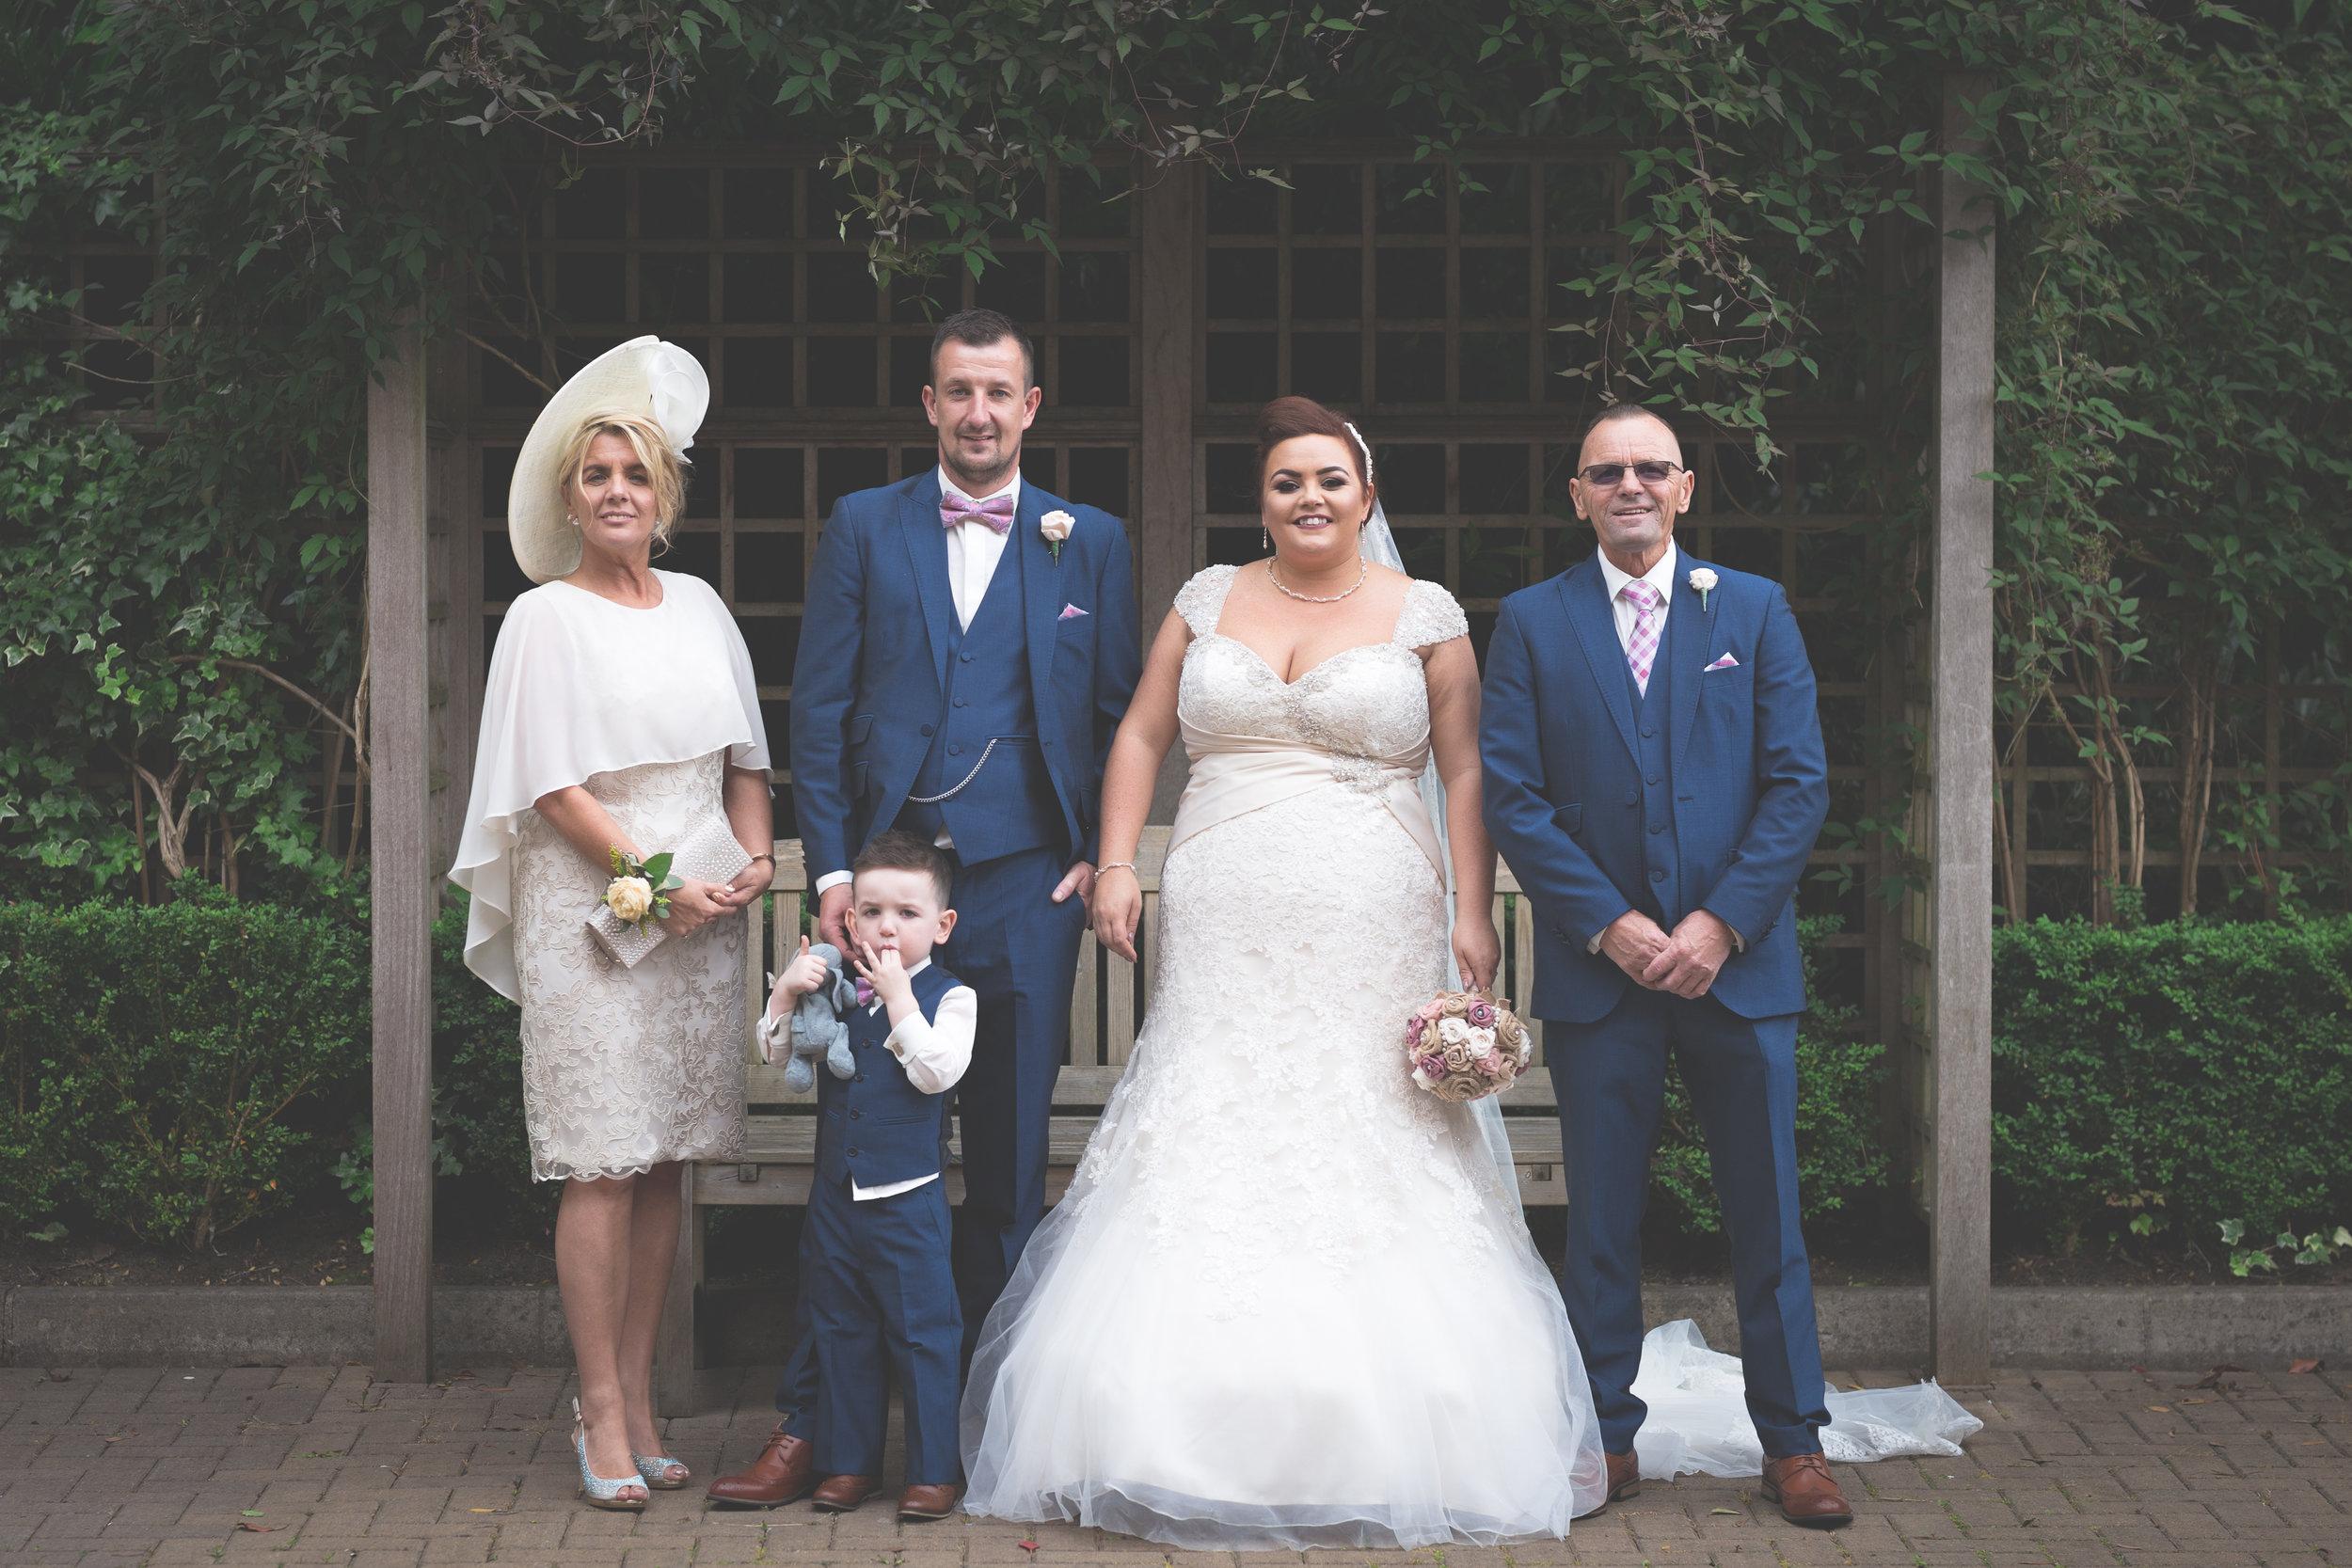 Antoinette & Stephen - Portraits   Brian McEwan Photography   Wedding Photographer Northern Ireland 52.jpg